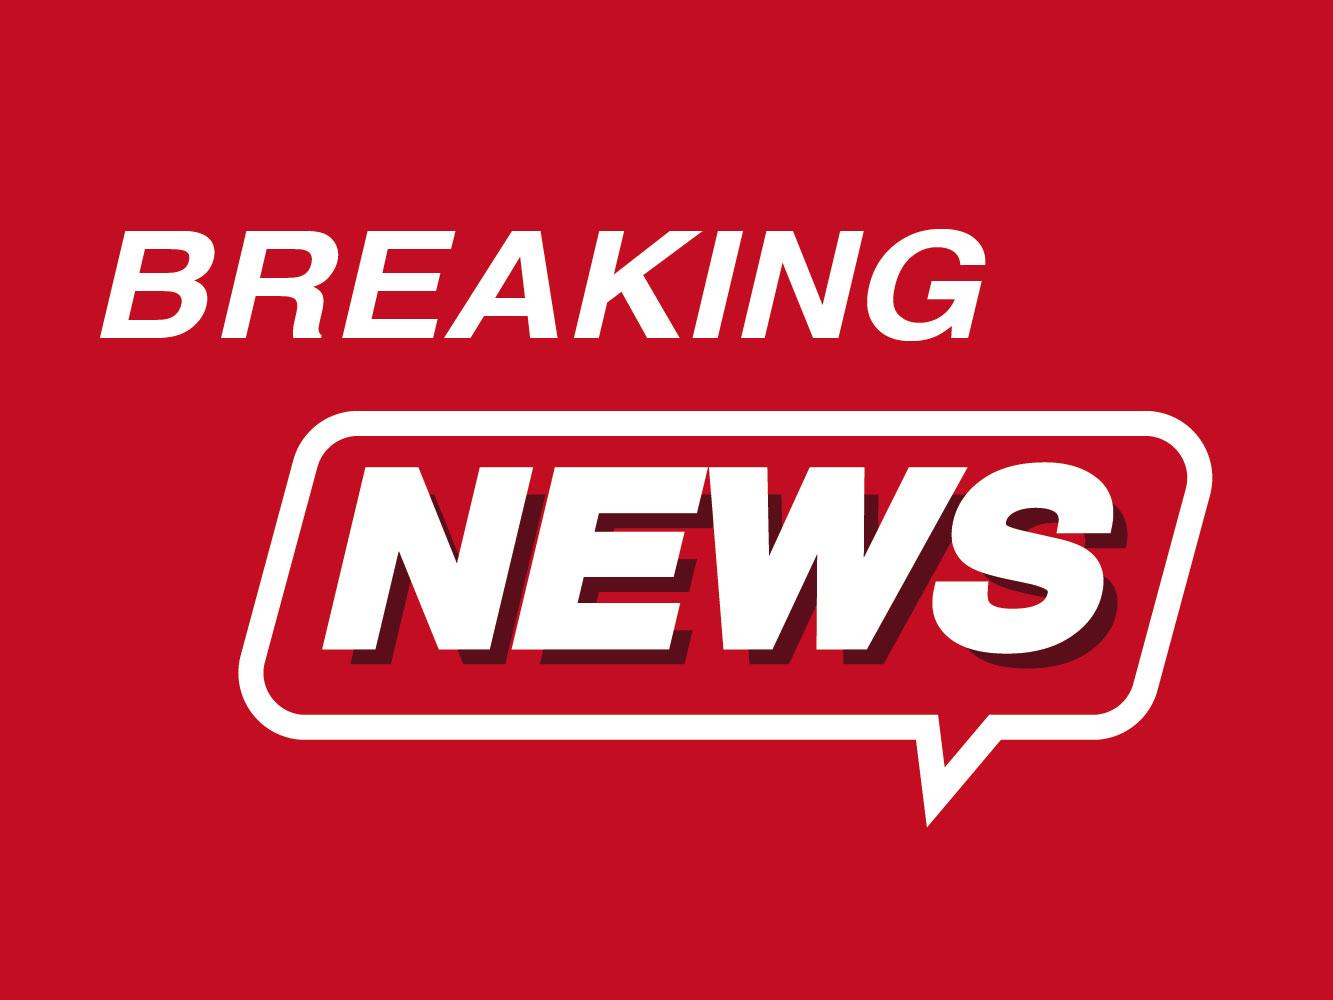 5.0-magnitude quake hits 45km N of Gueiria, Venezuela -- USGS